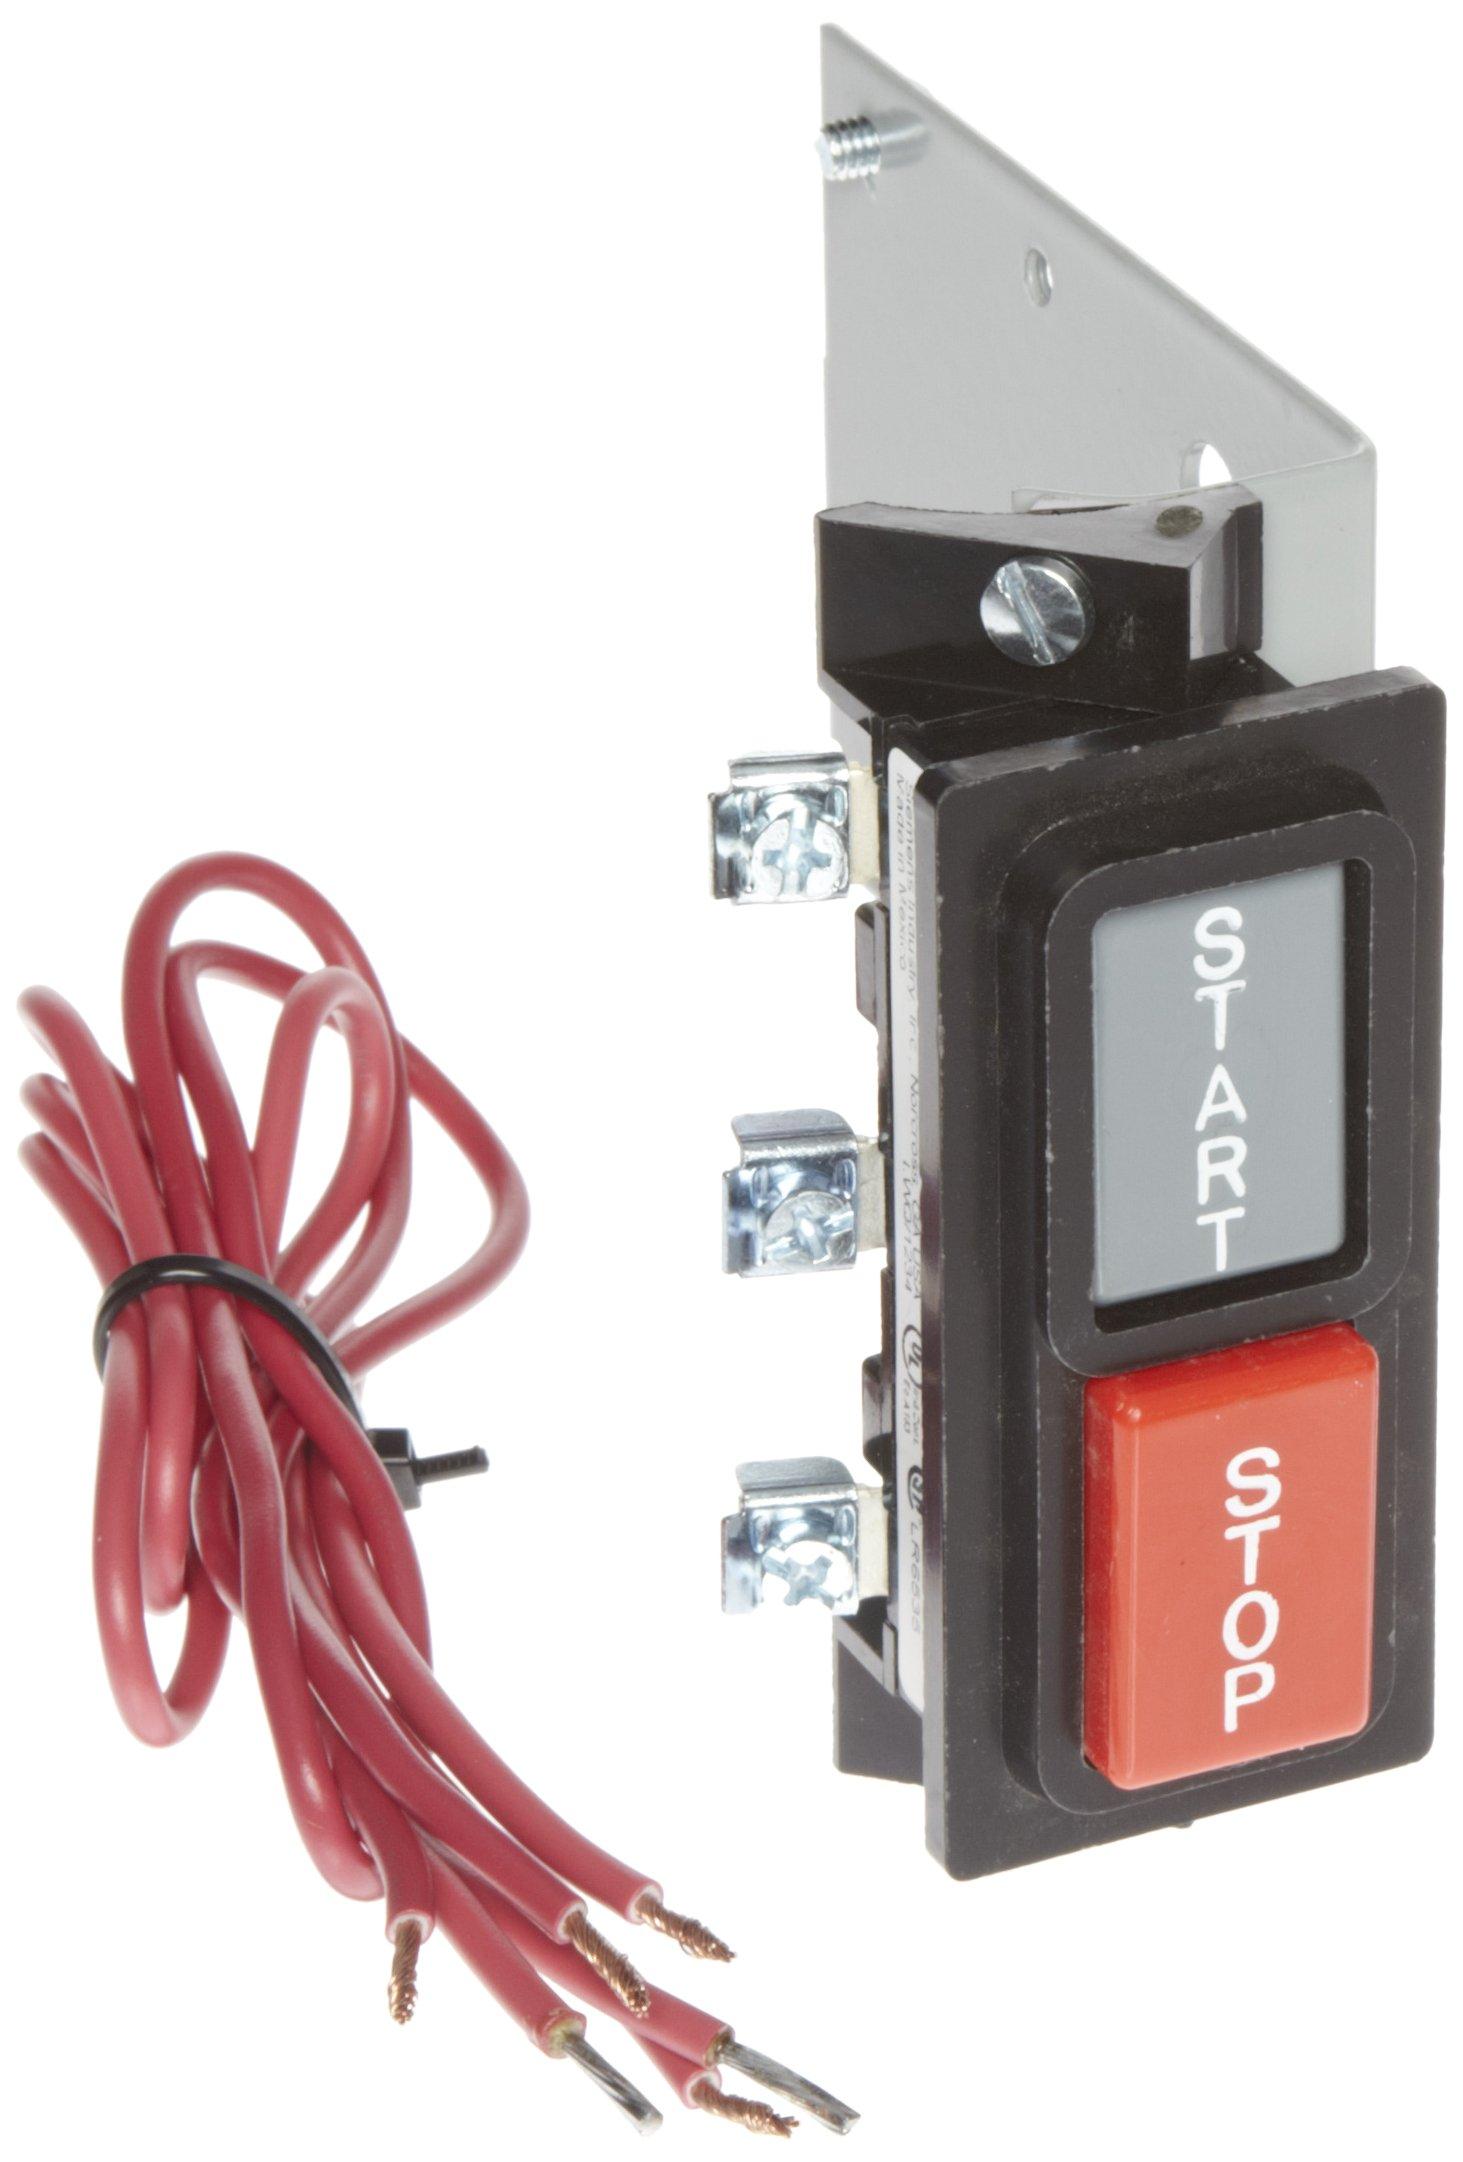 Siemens 49SBPB5 Pilot Device, Start, Stop Push Buttons, 14, 40, LEN, CLM Class, 1 Enclosure Type, 00-4 or (20-100A) Controller Size